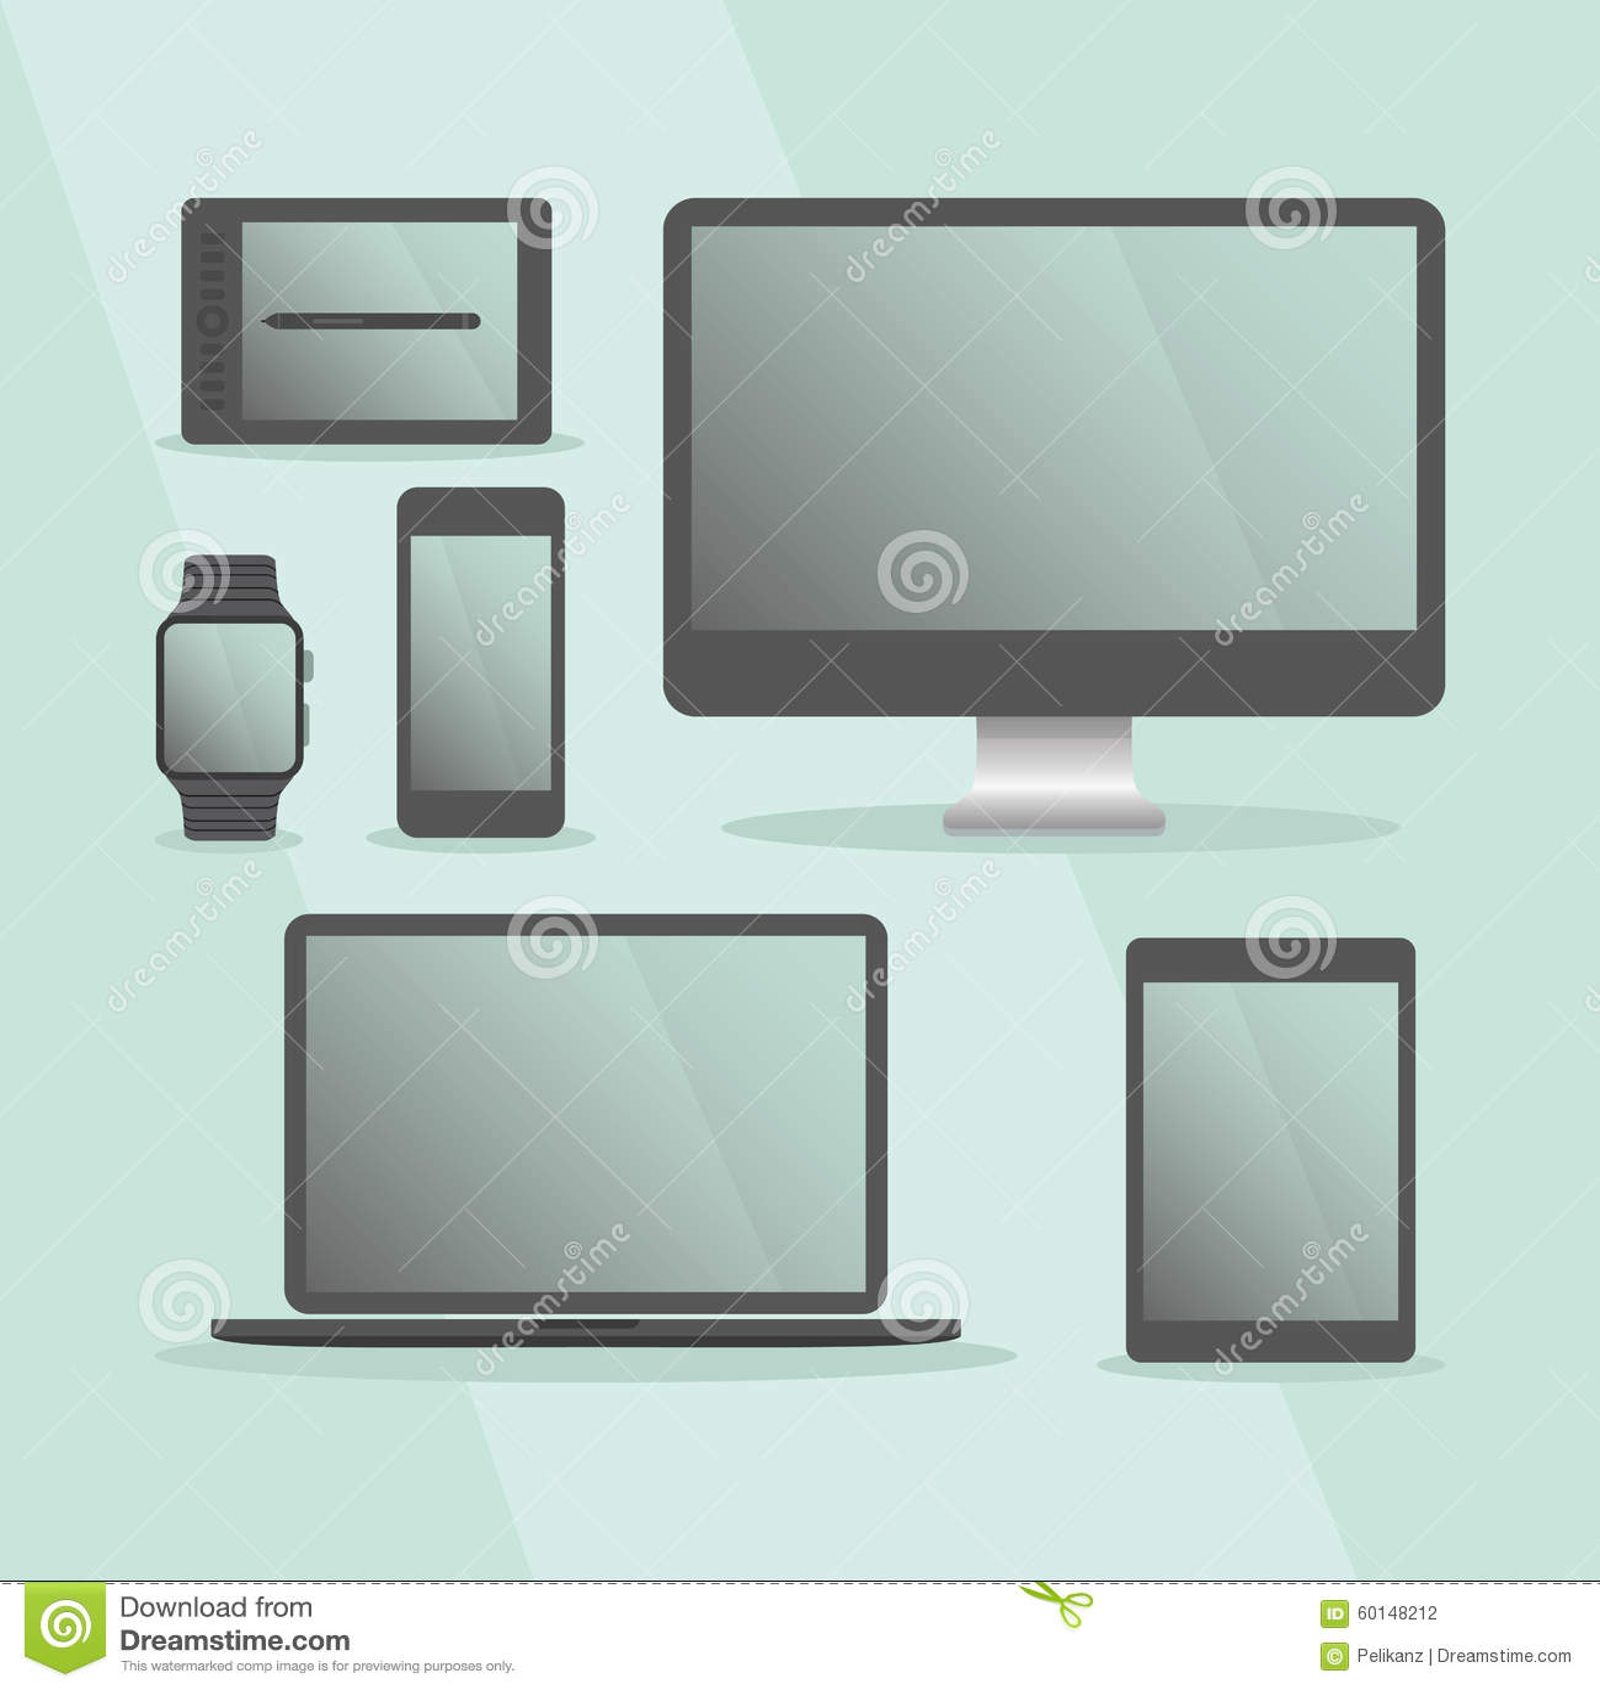 Modern digital devices and computer set with black frames set